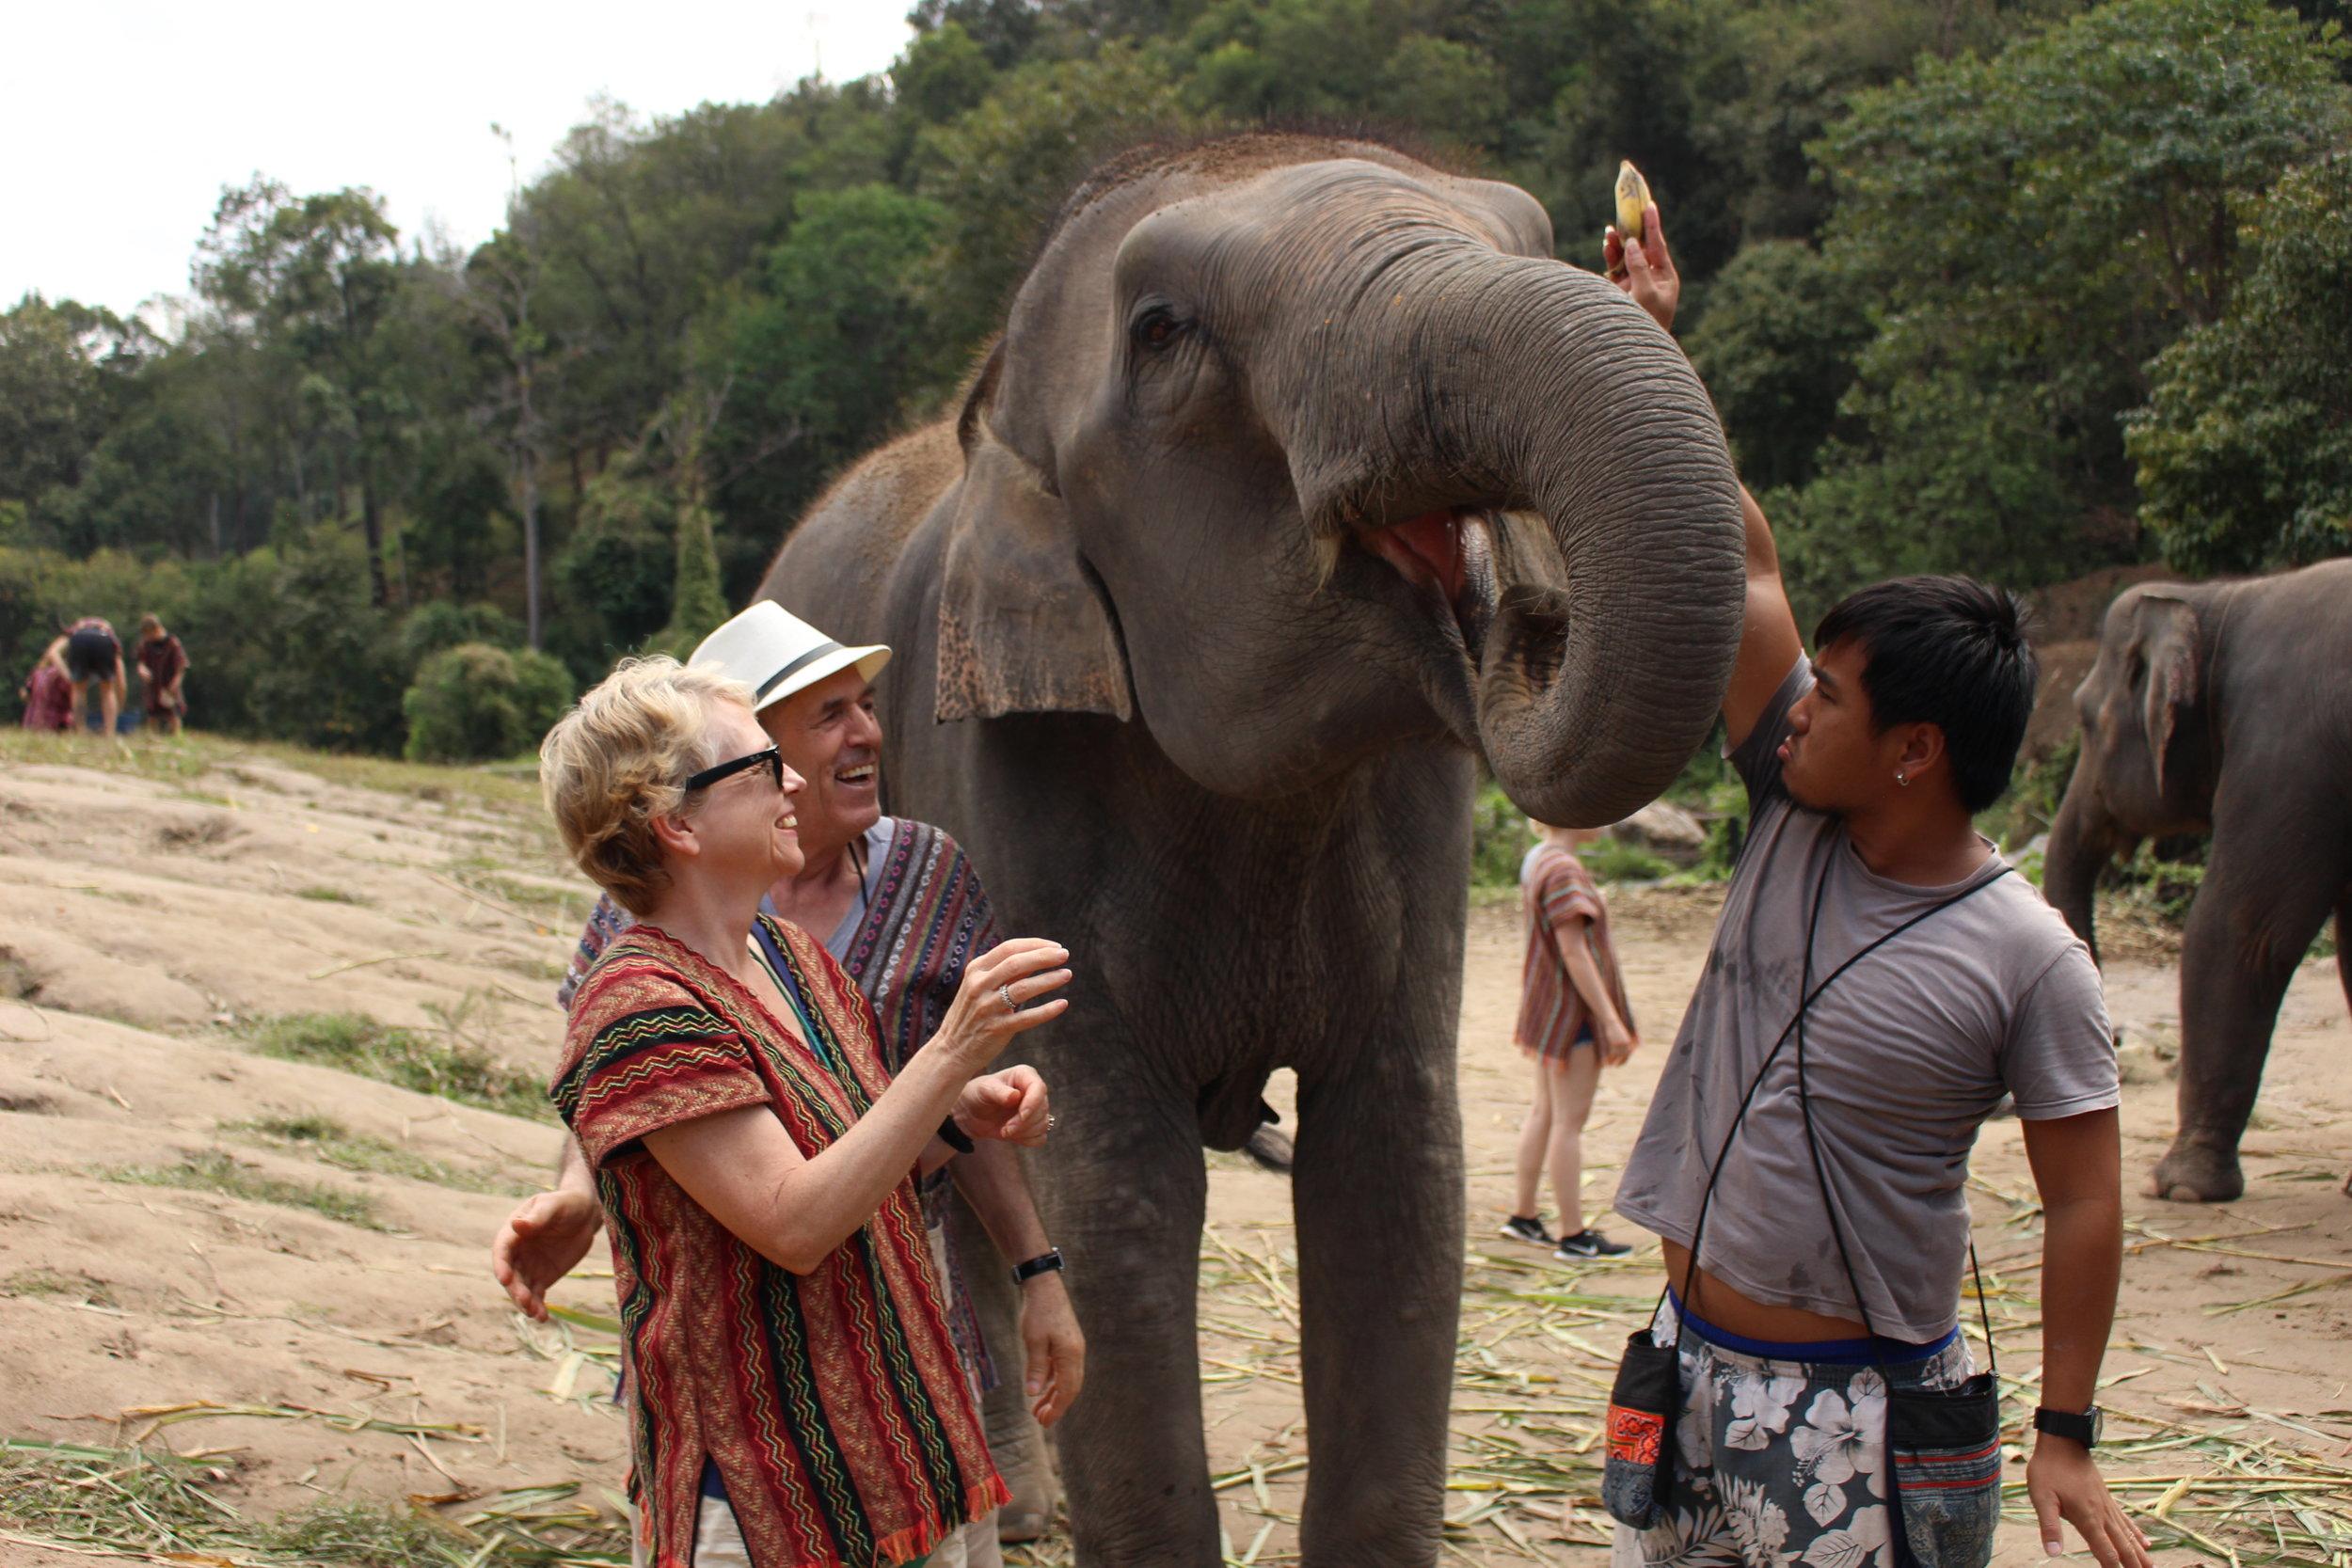 My mum and dad enjoying feeding the elephants